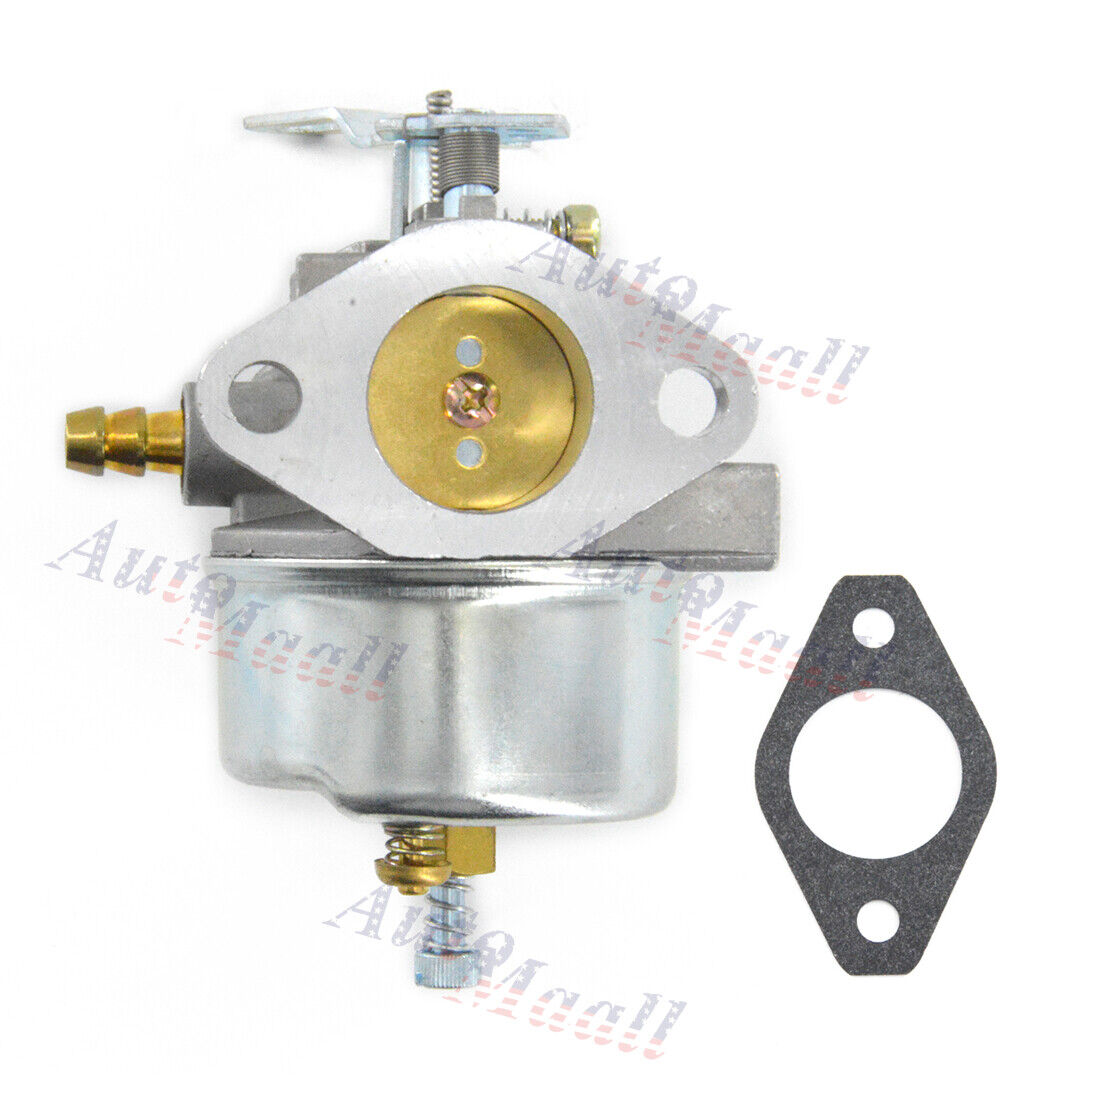 Carburetor Carb Carby For Tecumseh 640349 640052 640054 HMSK80 HMSK90 LH318SA